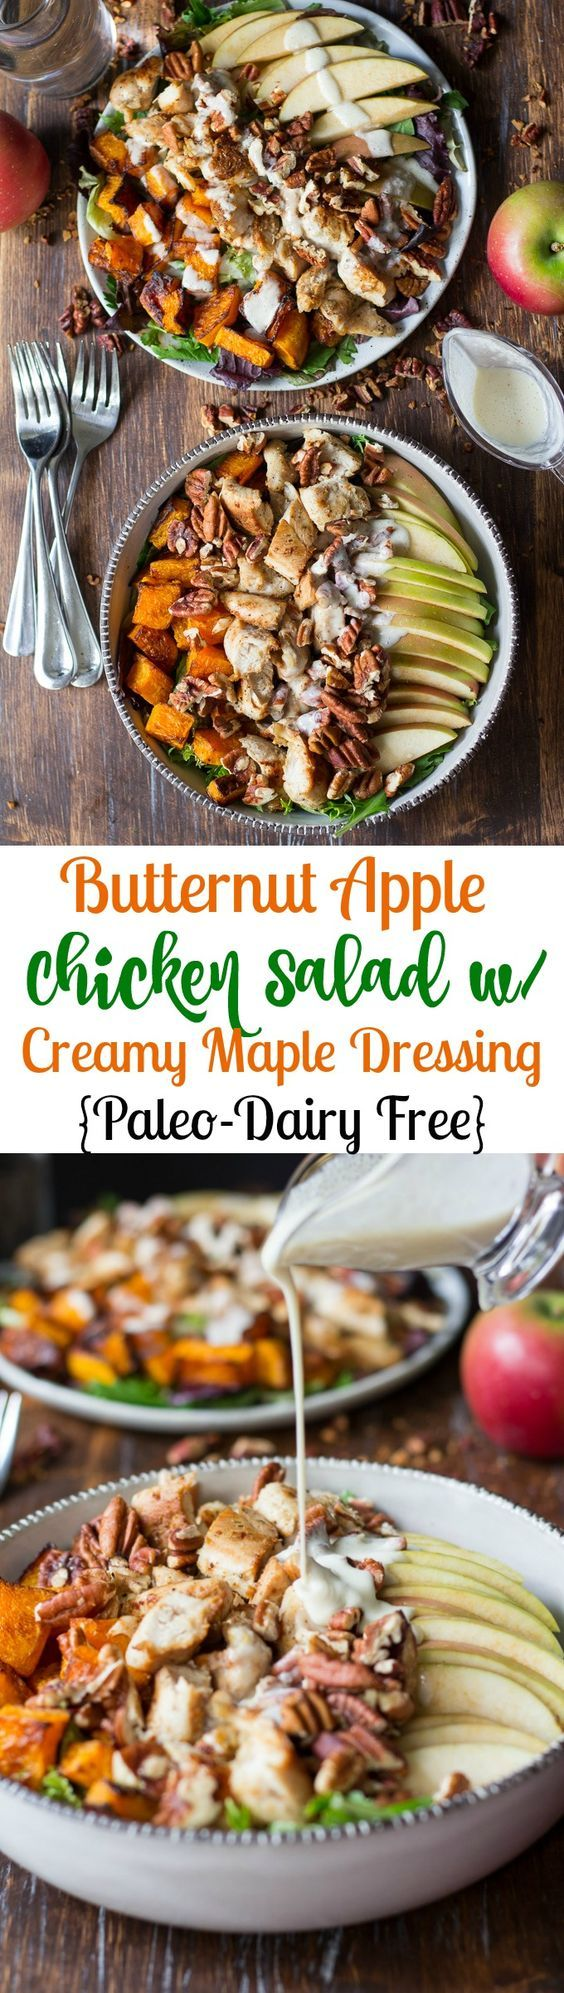 Paleo Butternut Apple Chicken Salad w/Creamy Maple Dressing